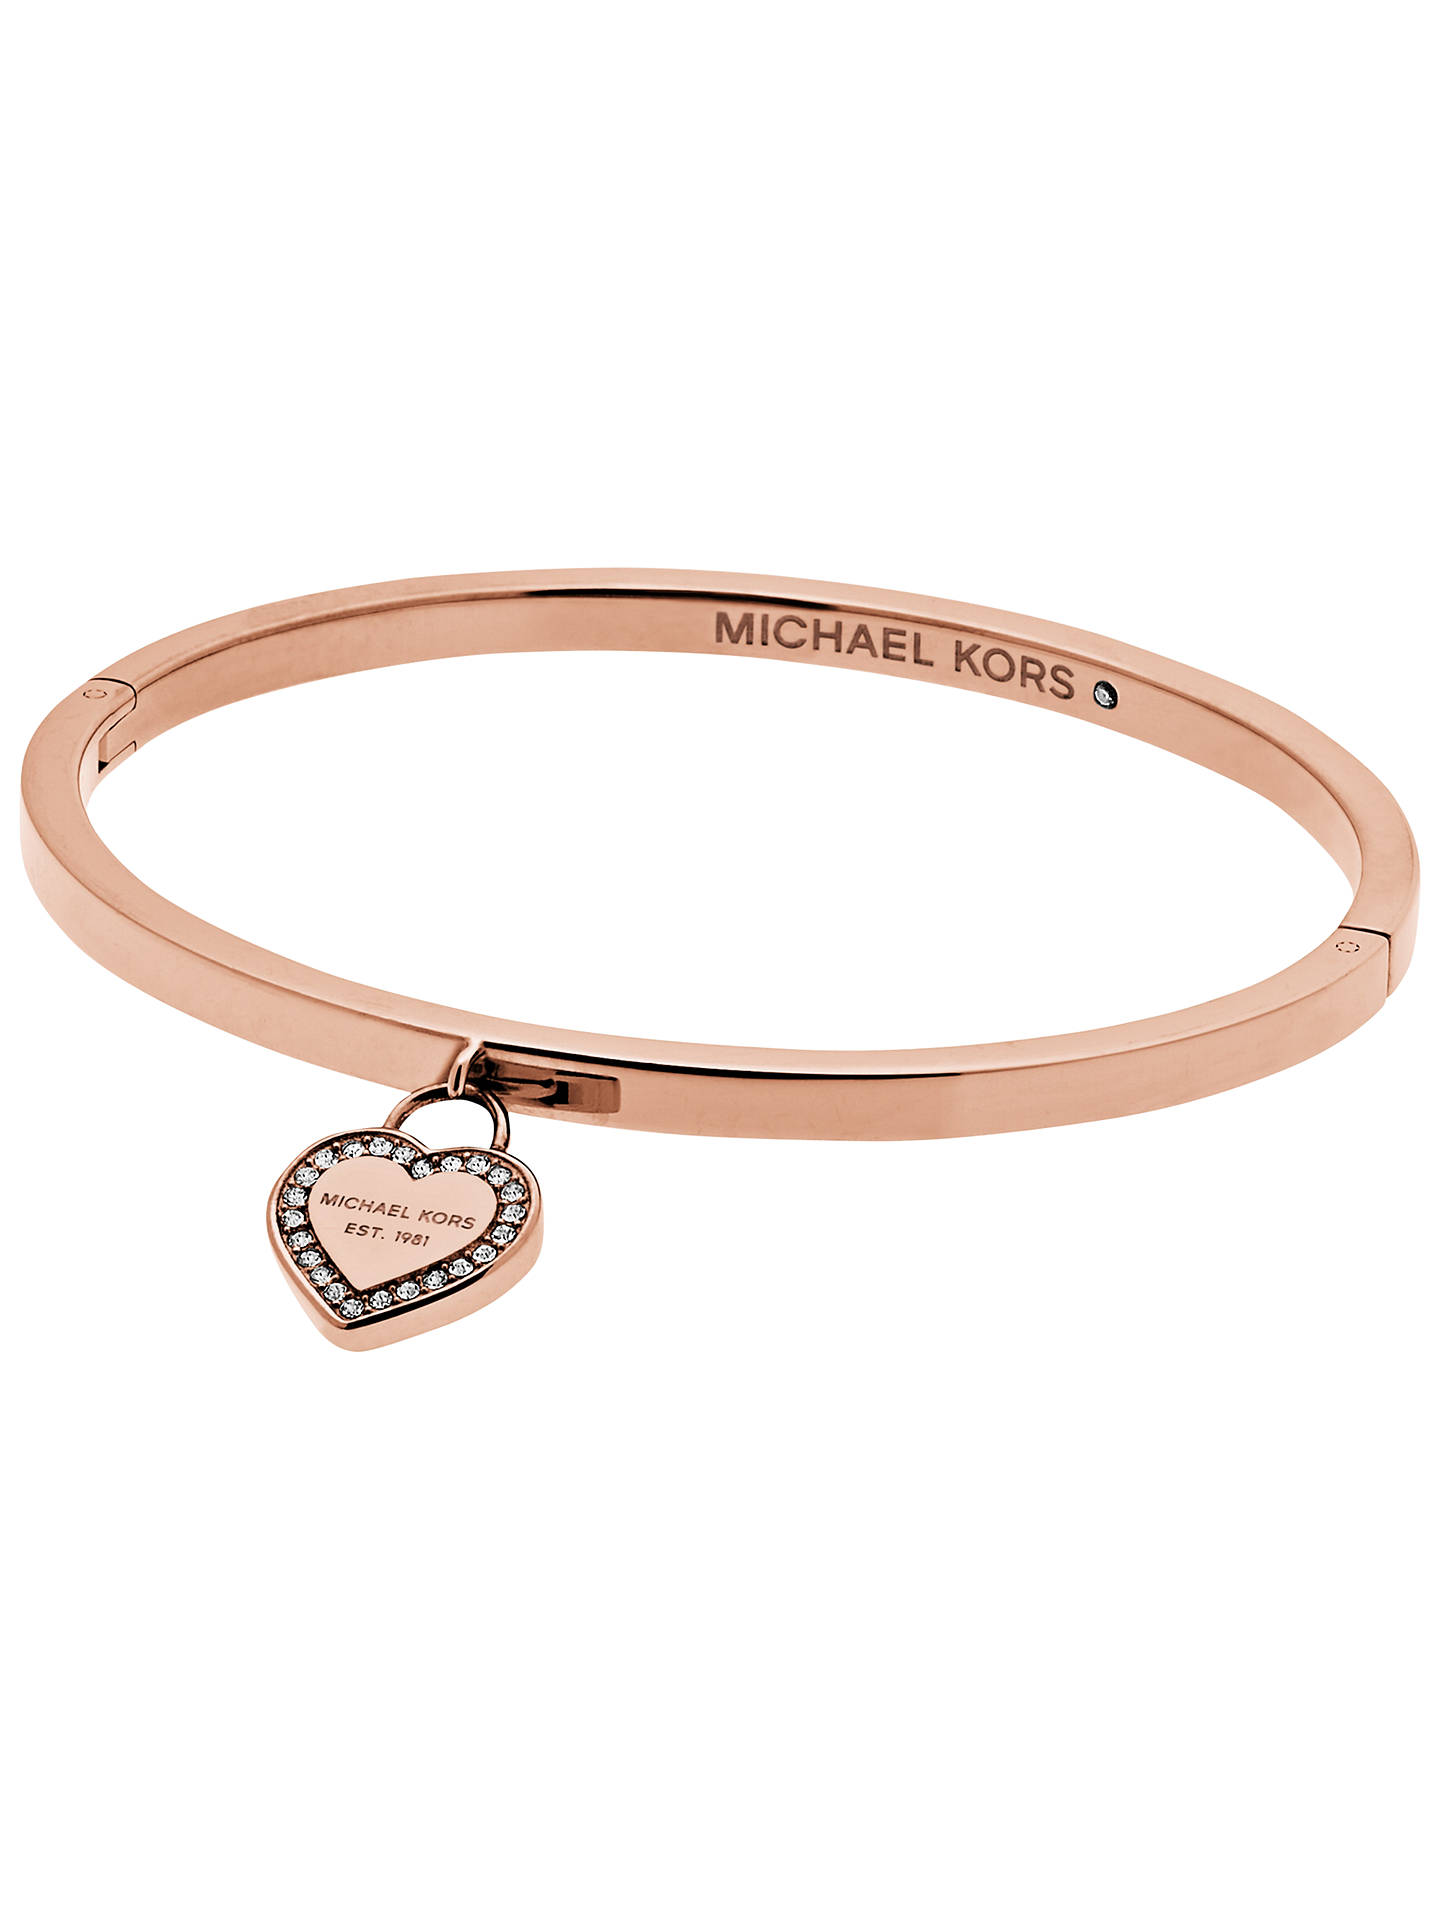 Michael Kors Heart Bangle Rose Gold Mkj5039791 Online At Johnlewis